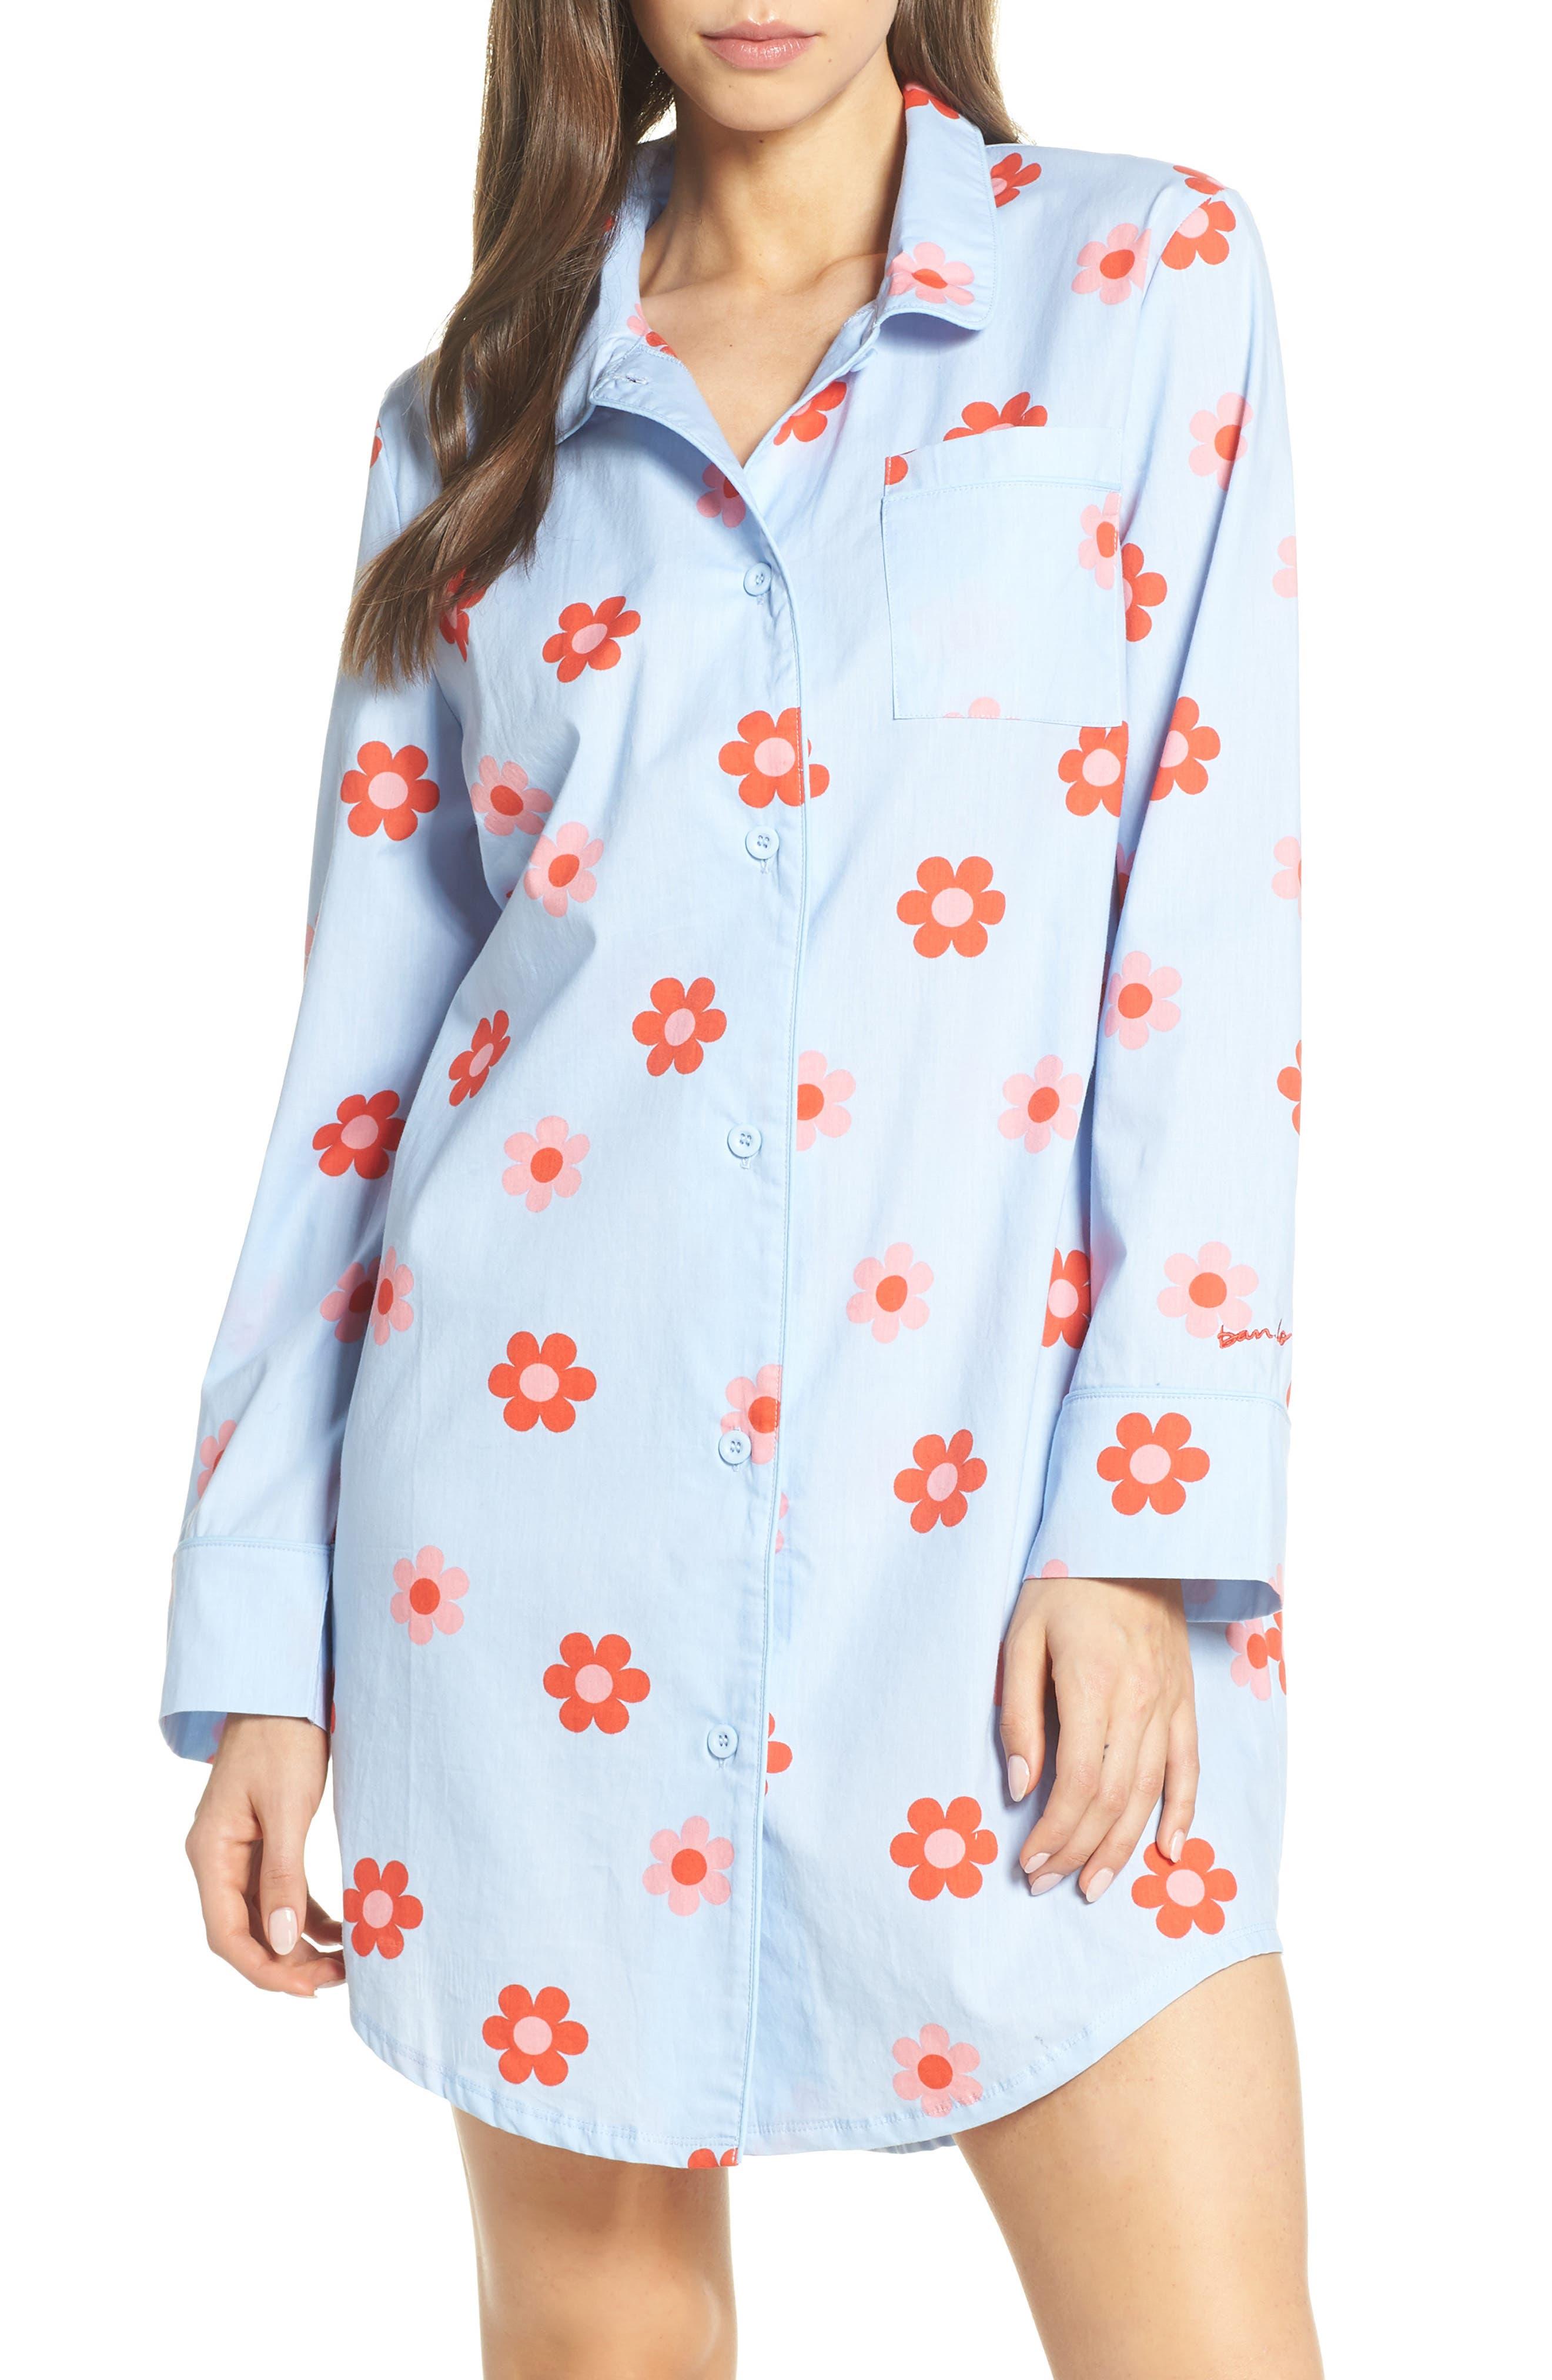 BAN.DO Retro Daisy Sleep Shirt, Main, color, LIGHT BLUE